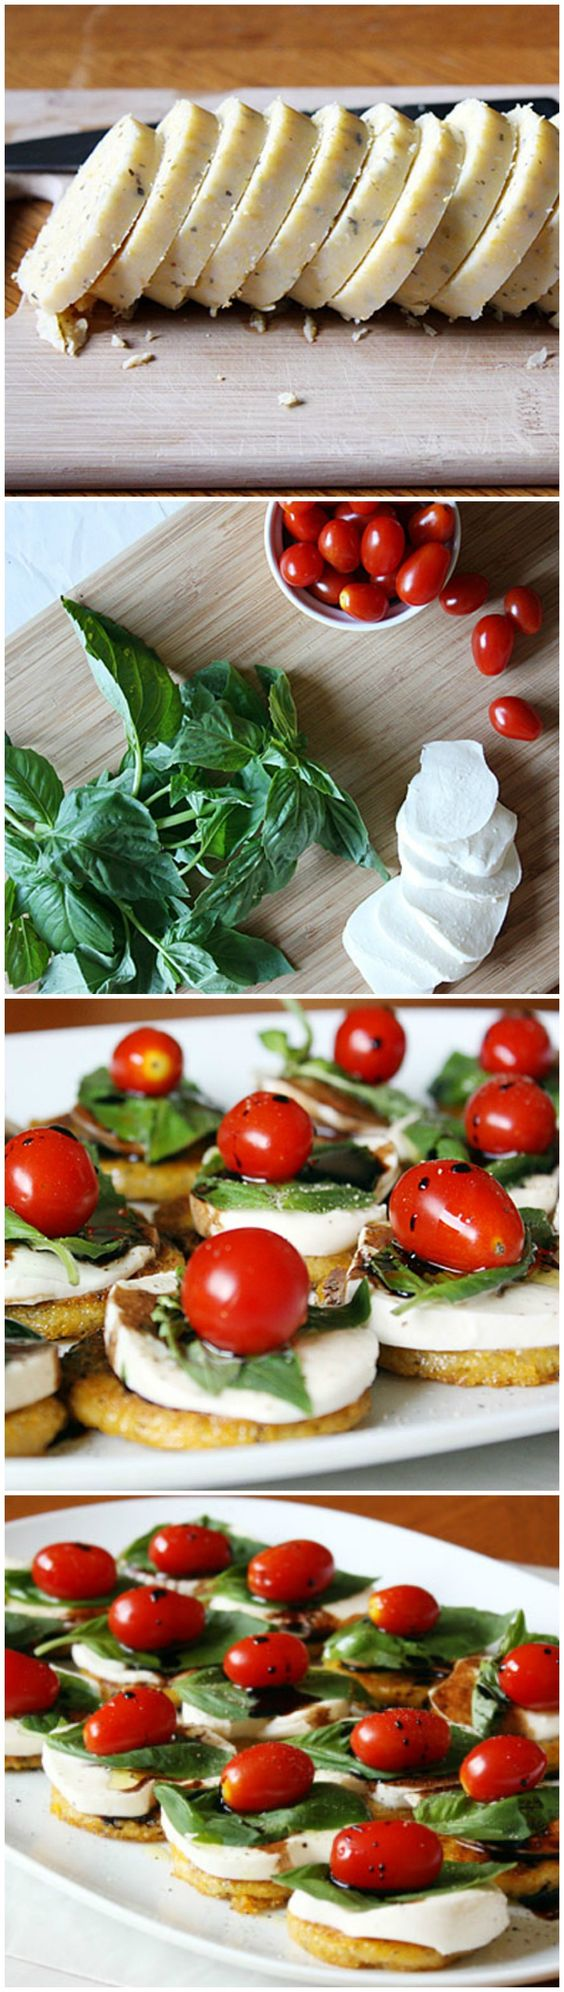 Polenta, Balsamic vinegar and Mozzarella on Pinterest